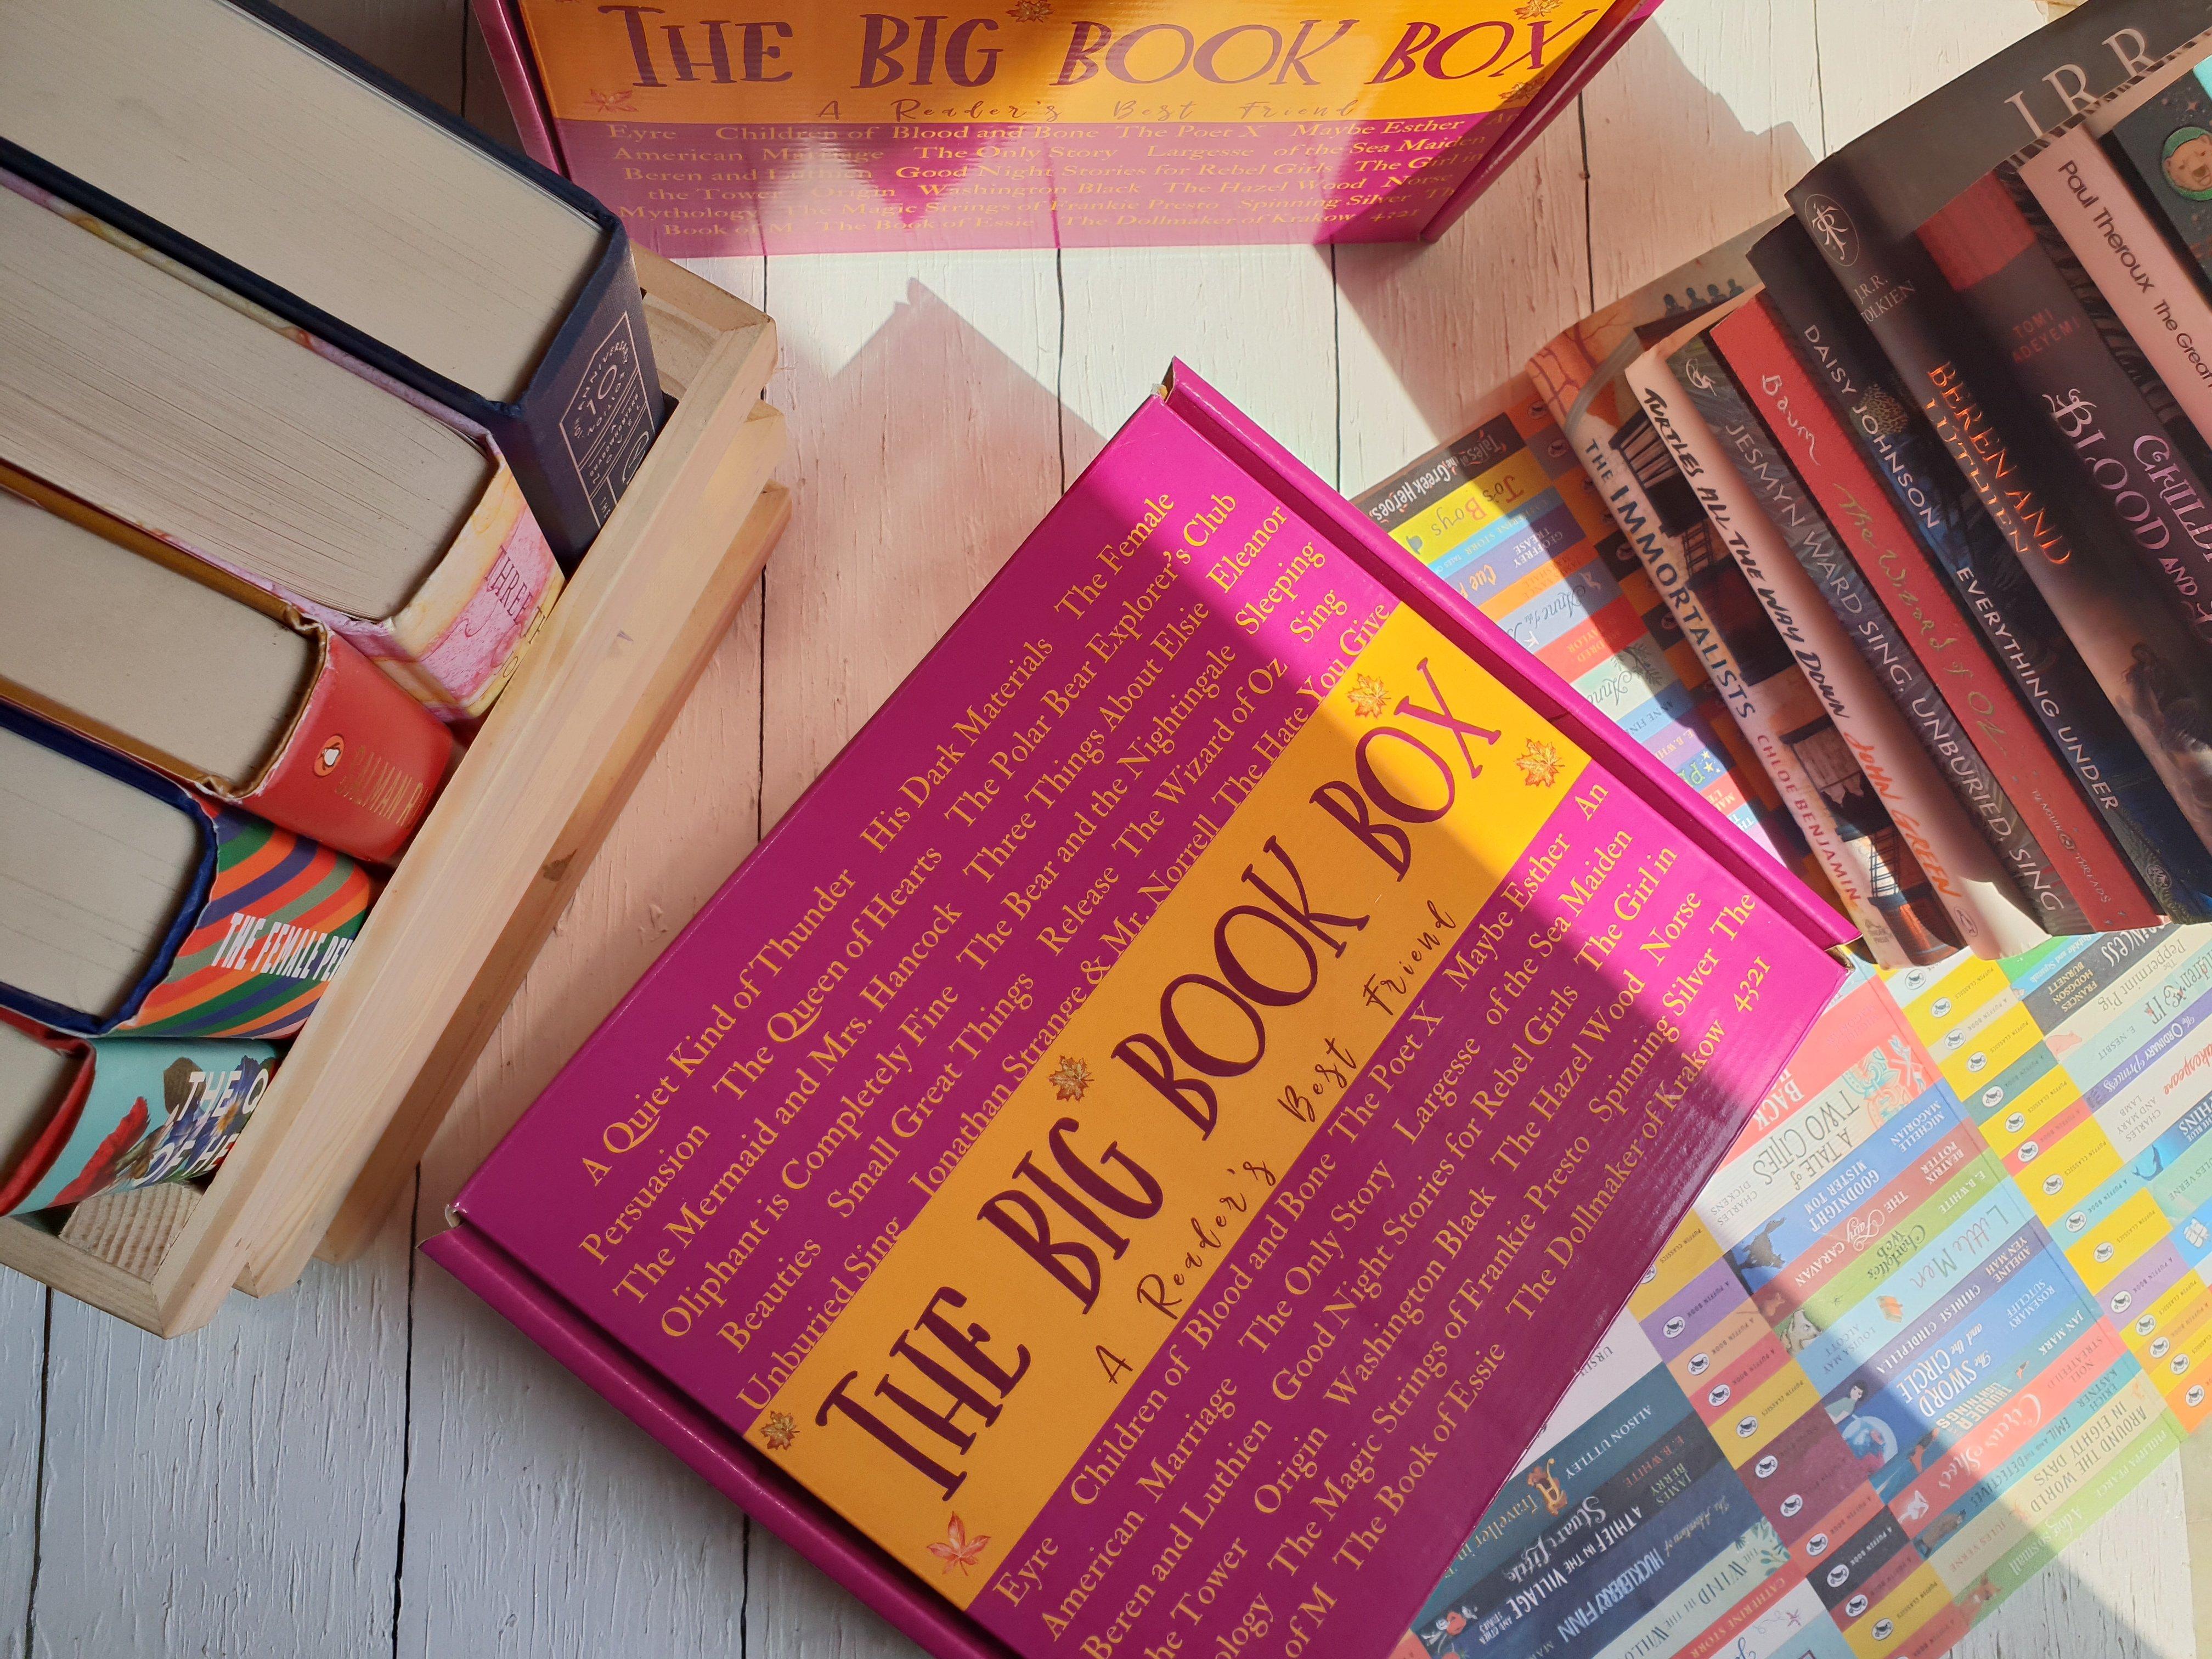 The Big Book Box Fall 2018